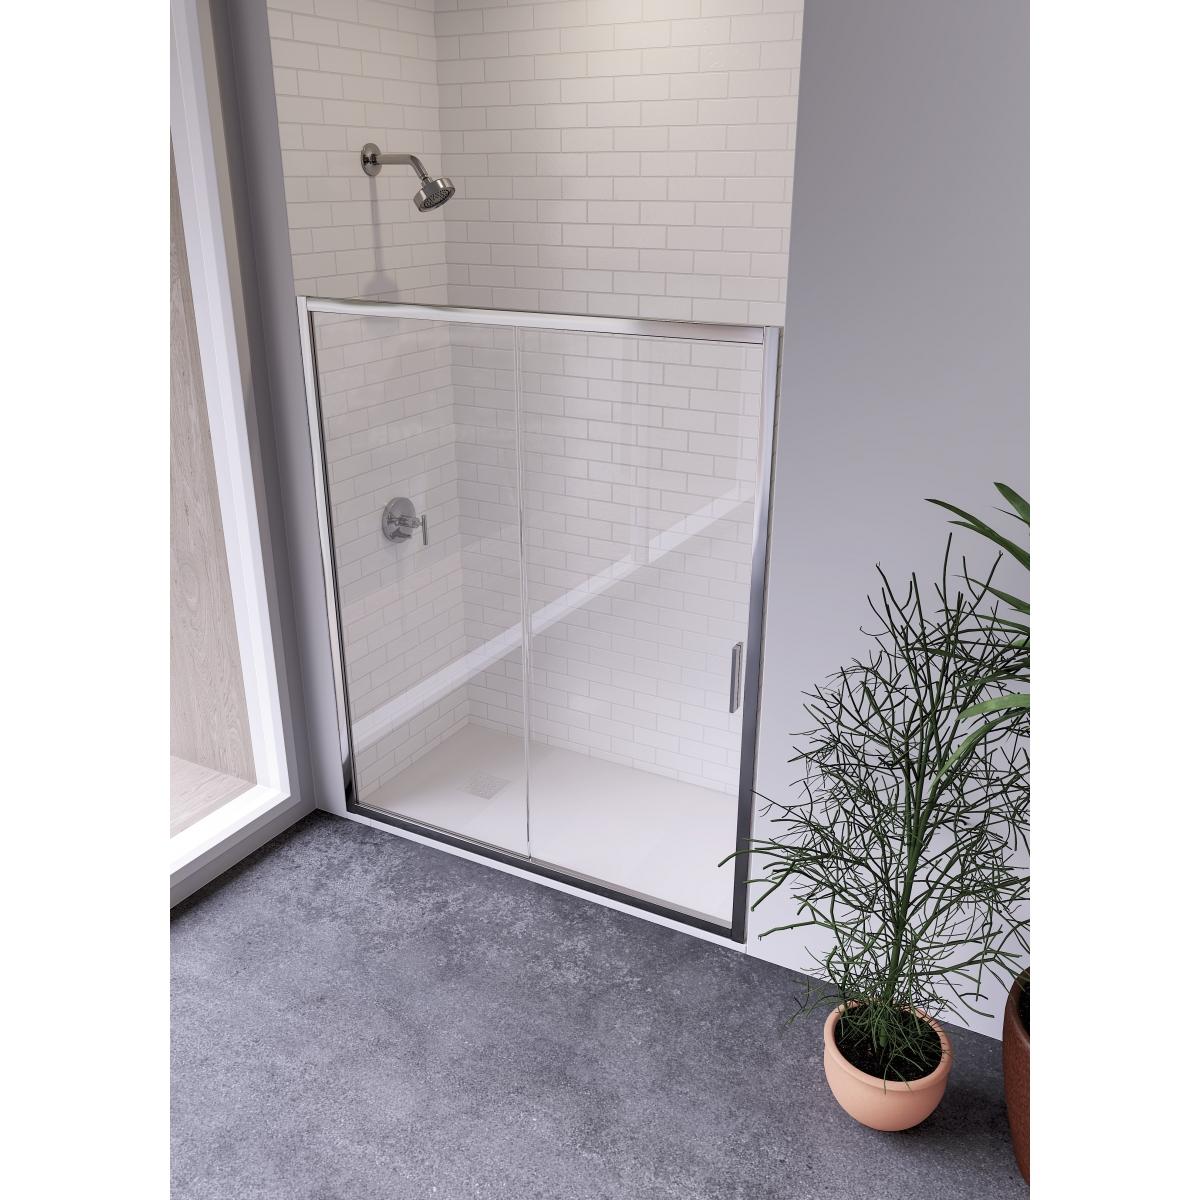 Mampara económica para ducha Tiber - Mamparas de duchas - Marca Anna Bagno